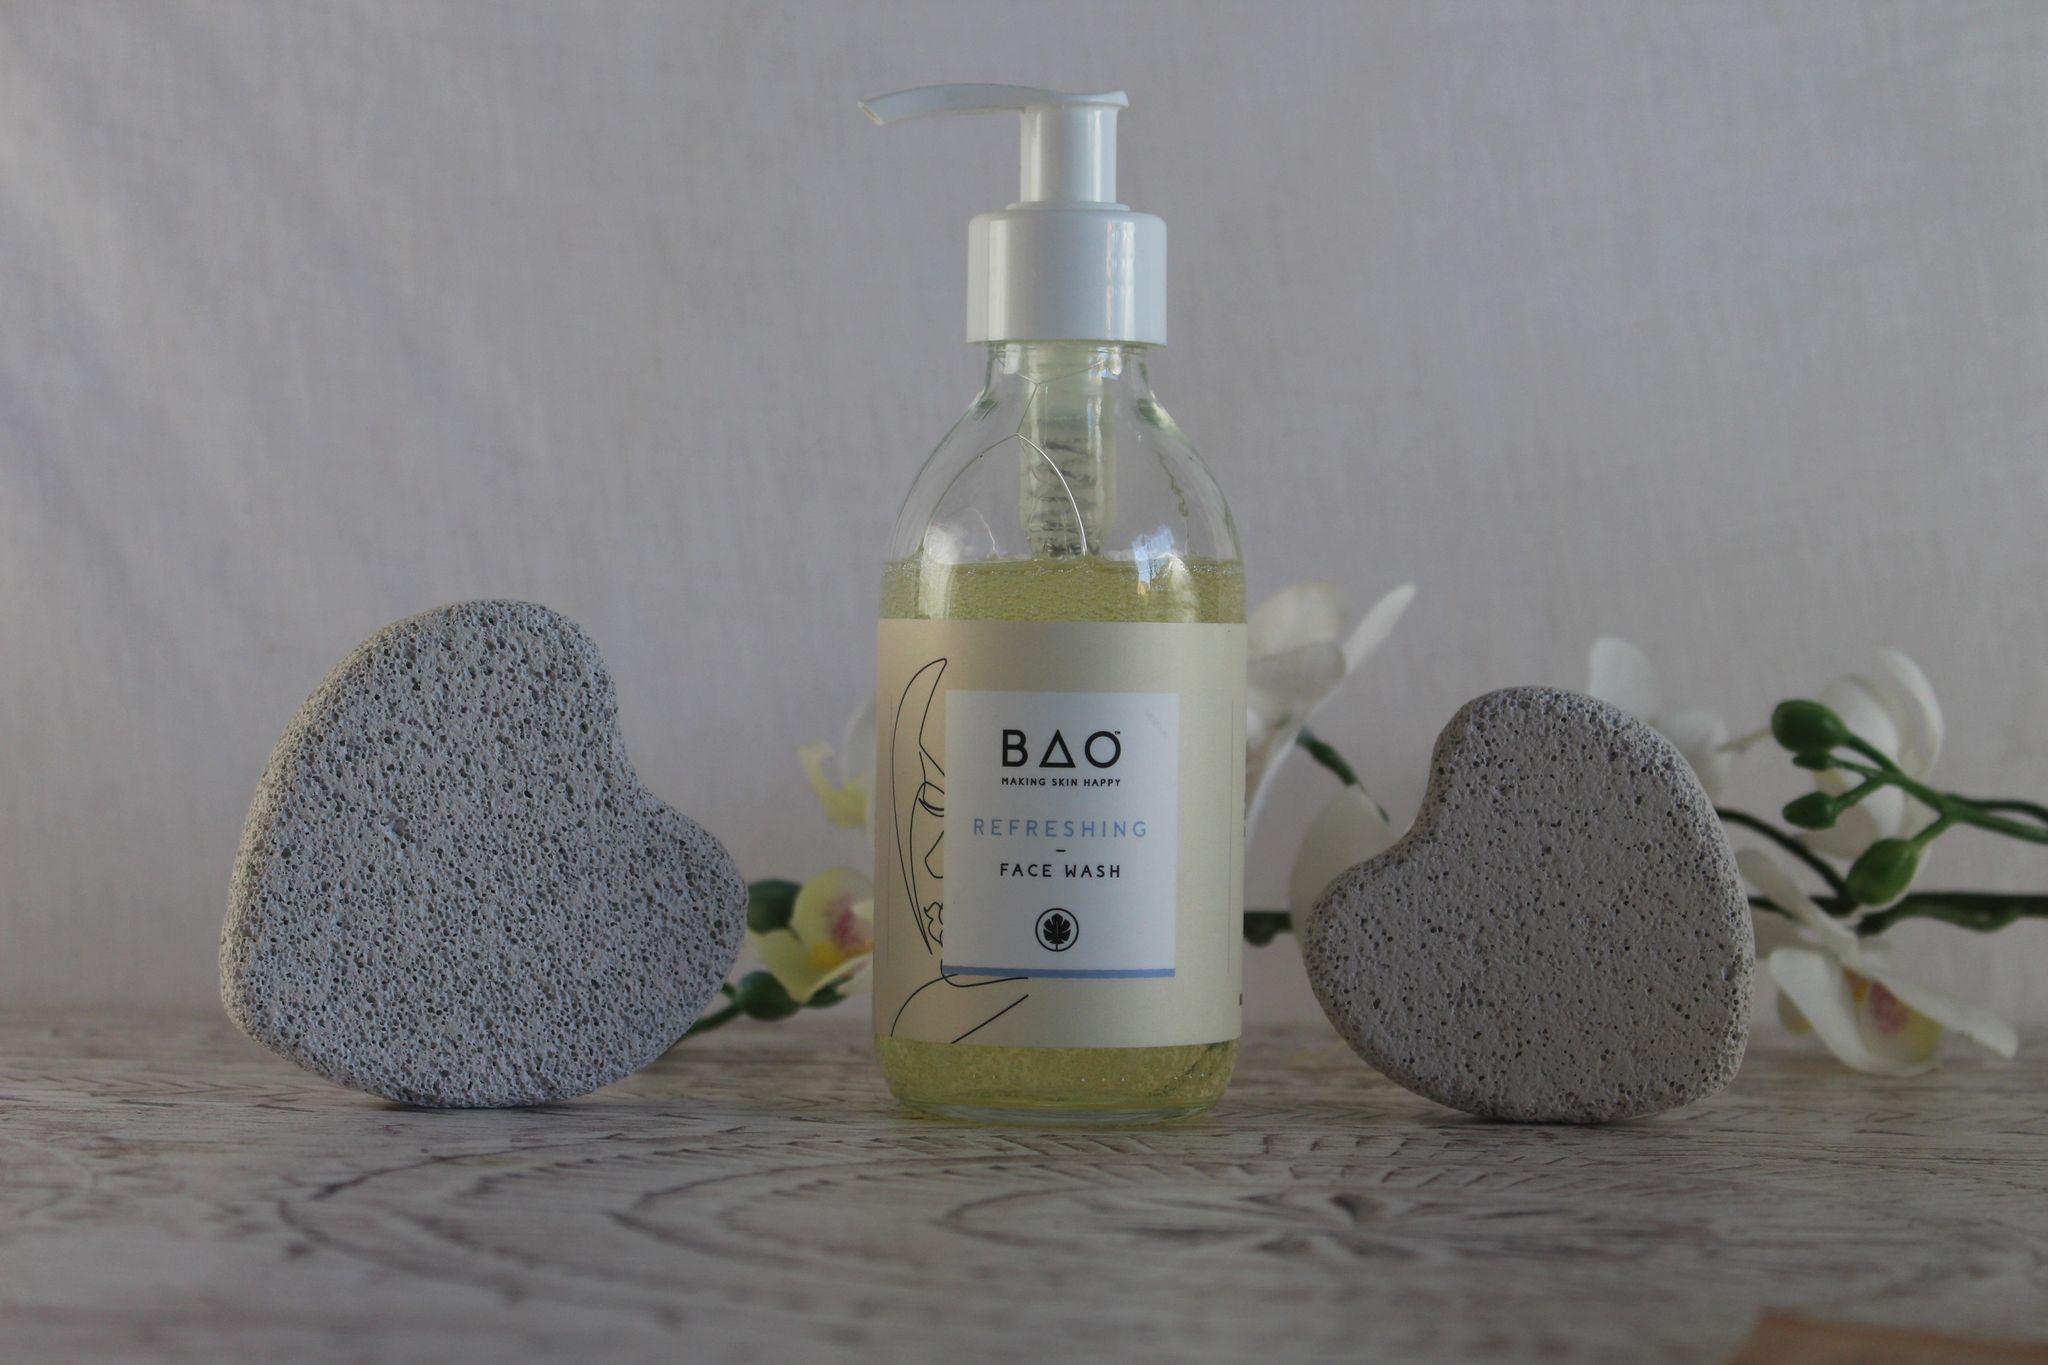 BAO Refreshing Face Wash review